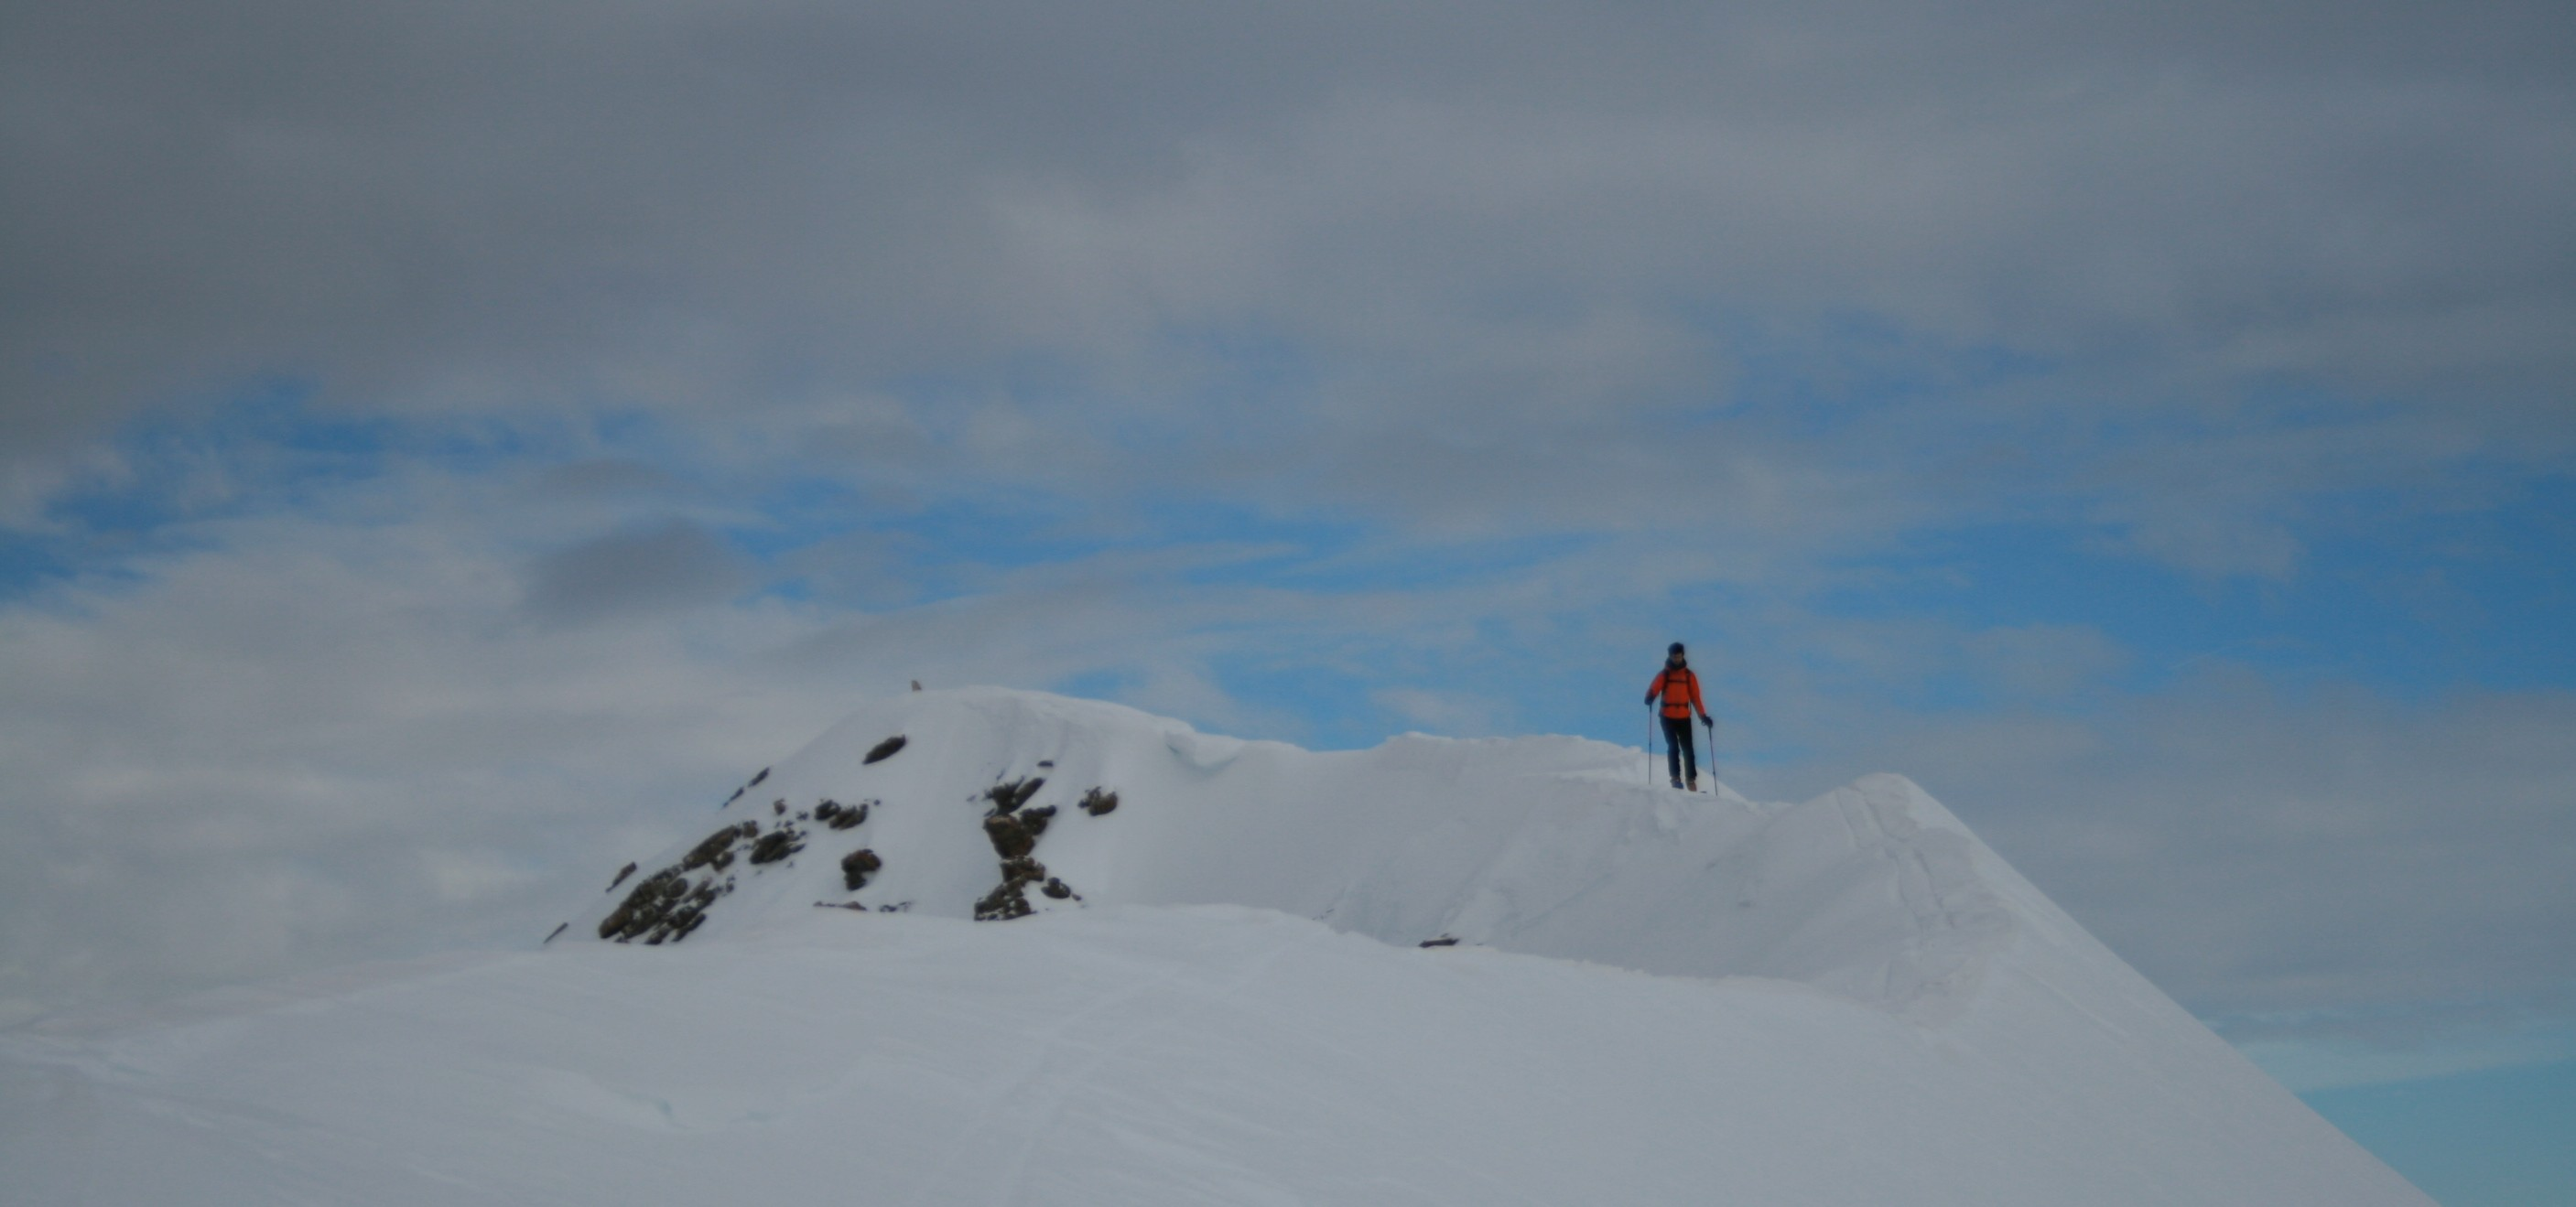 Les Orres - Du ski le matin